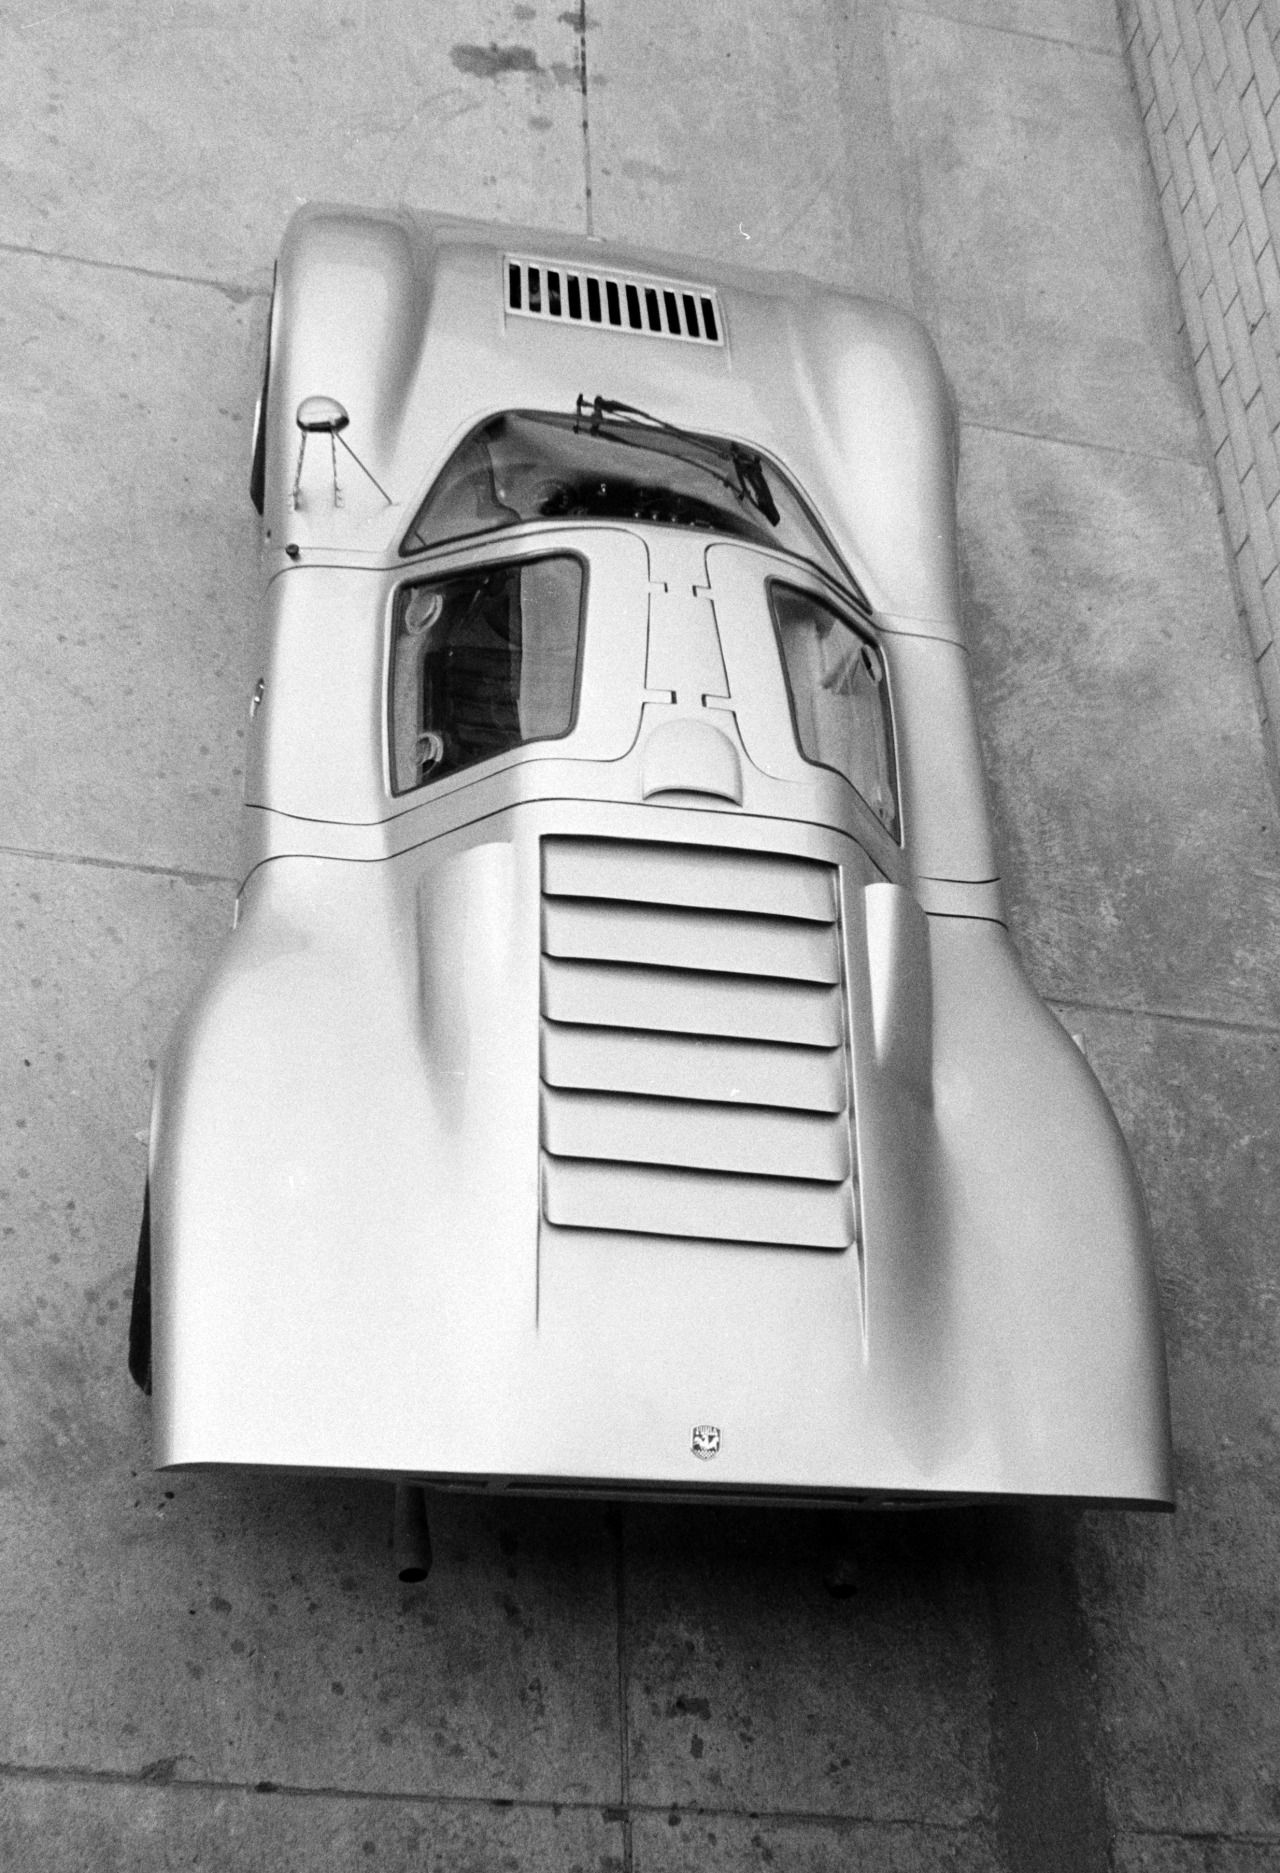 gashetka:    1972 | Furia-Lamborghini | Photo by Karl Ludvigsen | Source